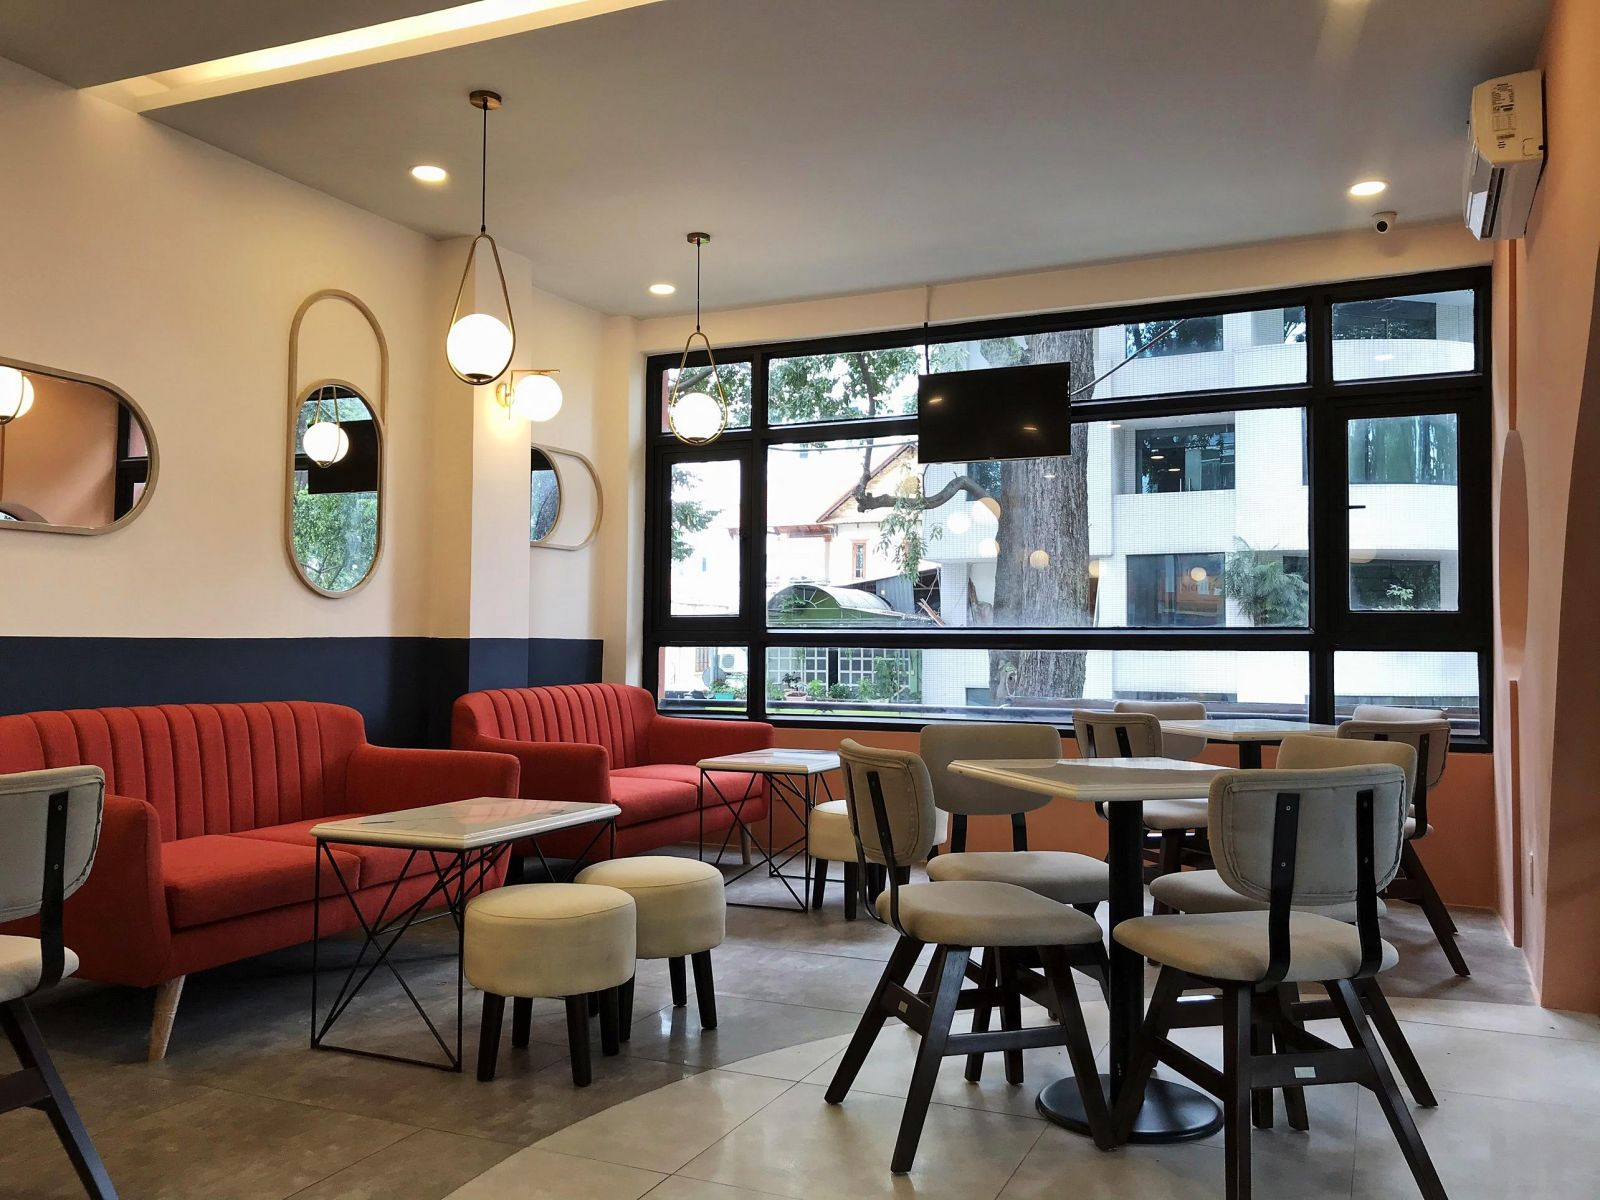 noi-that-Felicite-Coffee&Eatery-42-Tran-Cao-Van-Q3-15